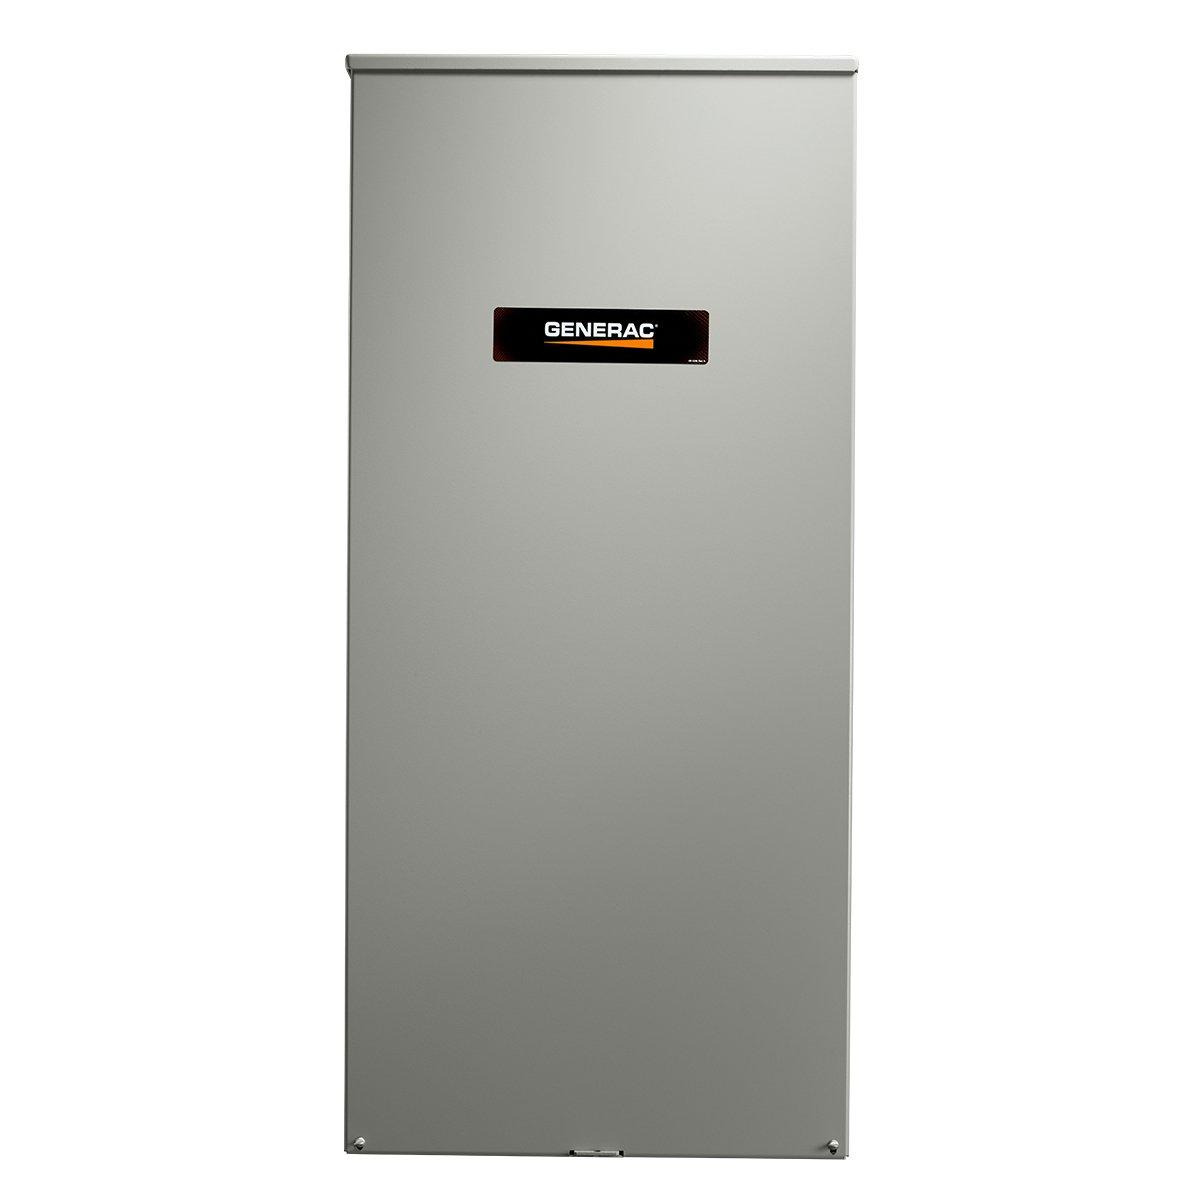 Generac RXSW150A3 150 AMP Smart Transfer Switch by Generac